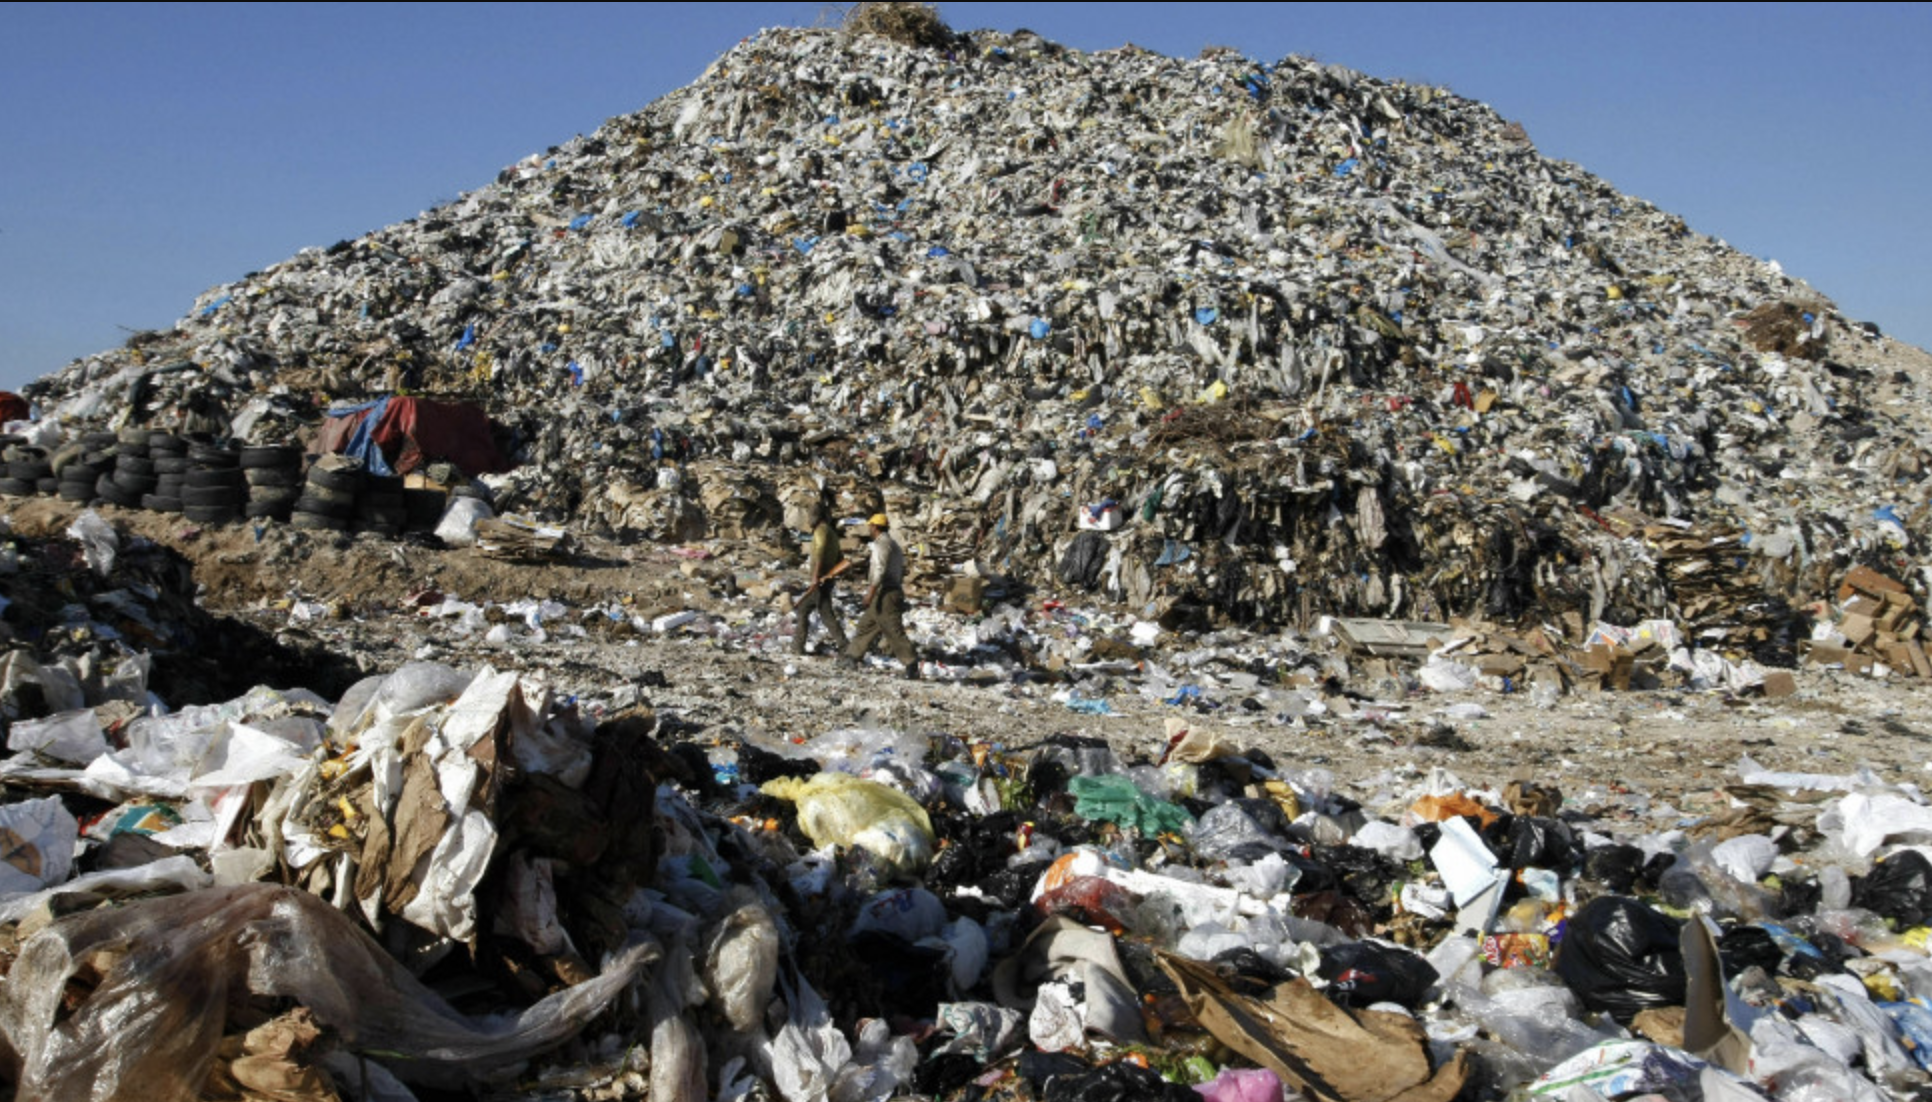 Lebanon landfill.png